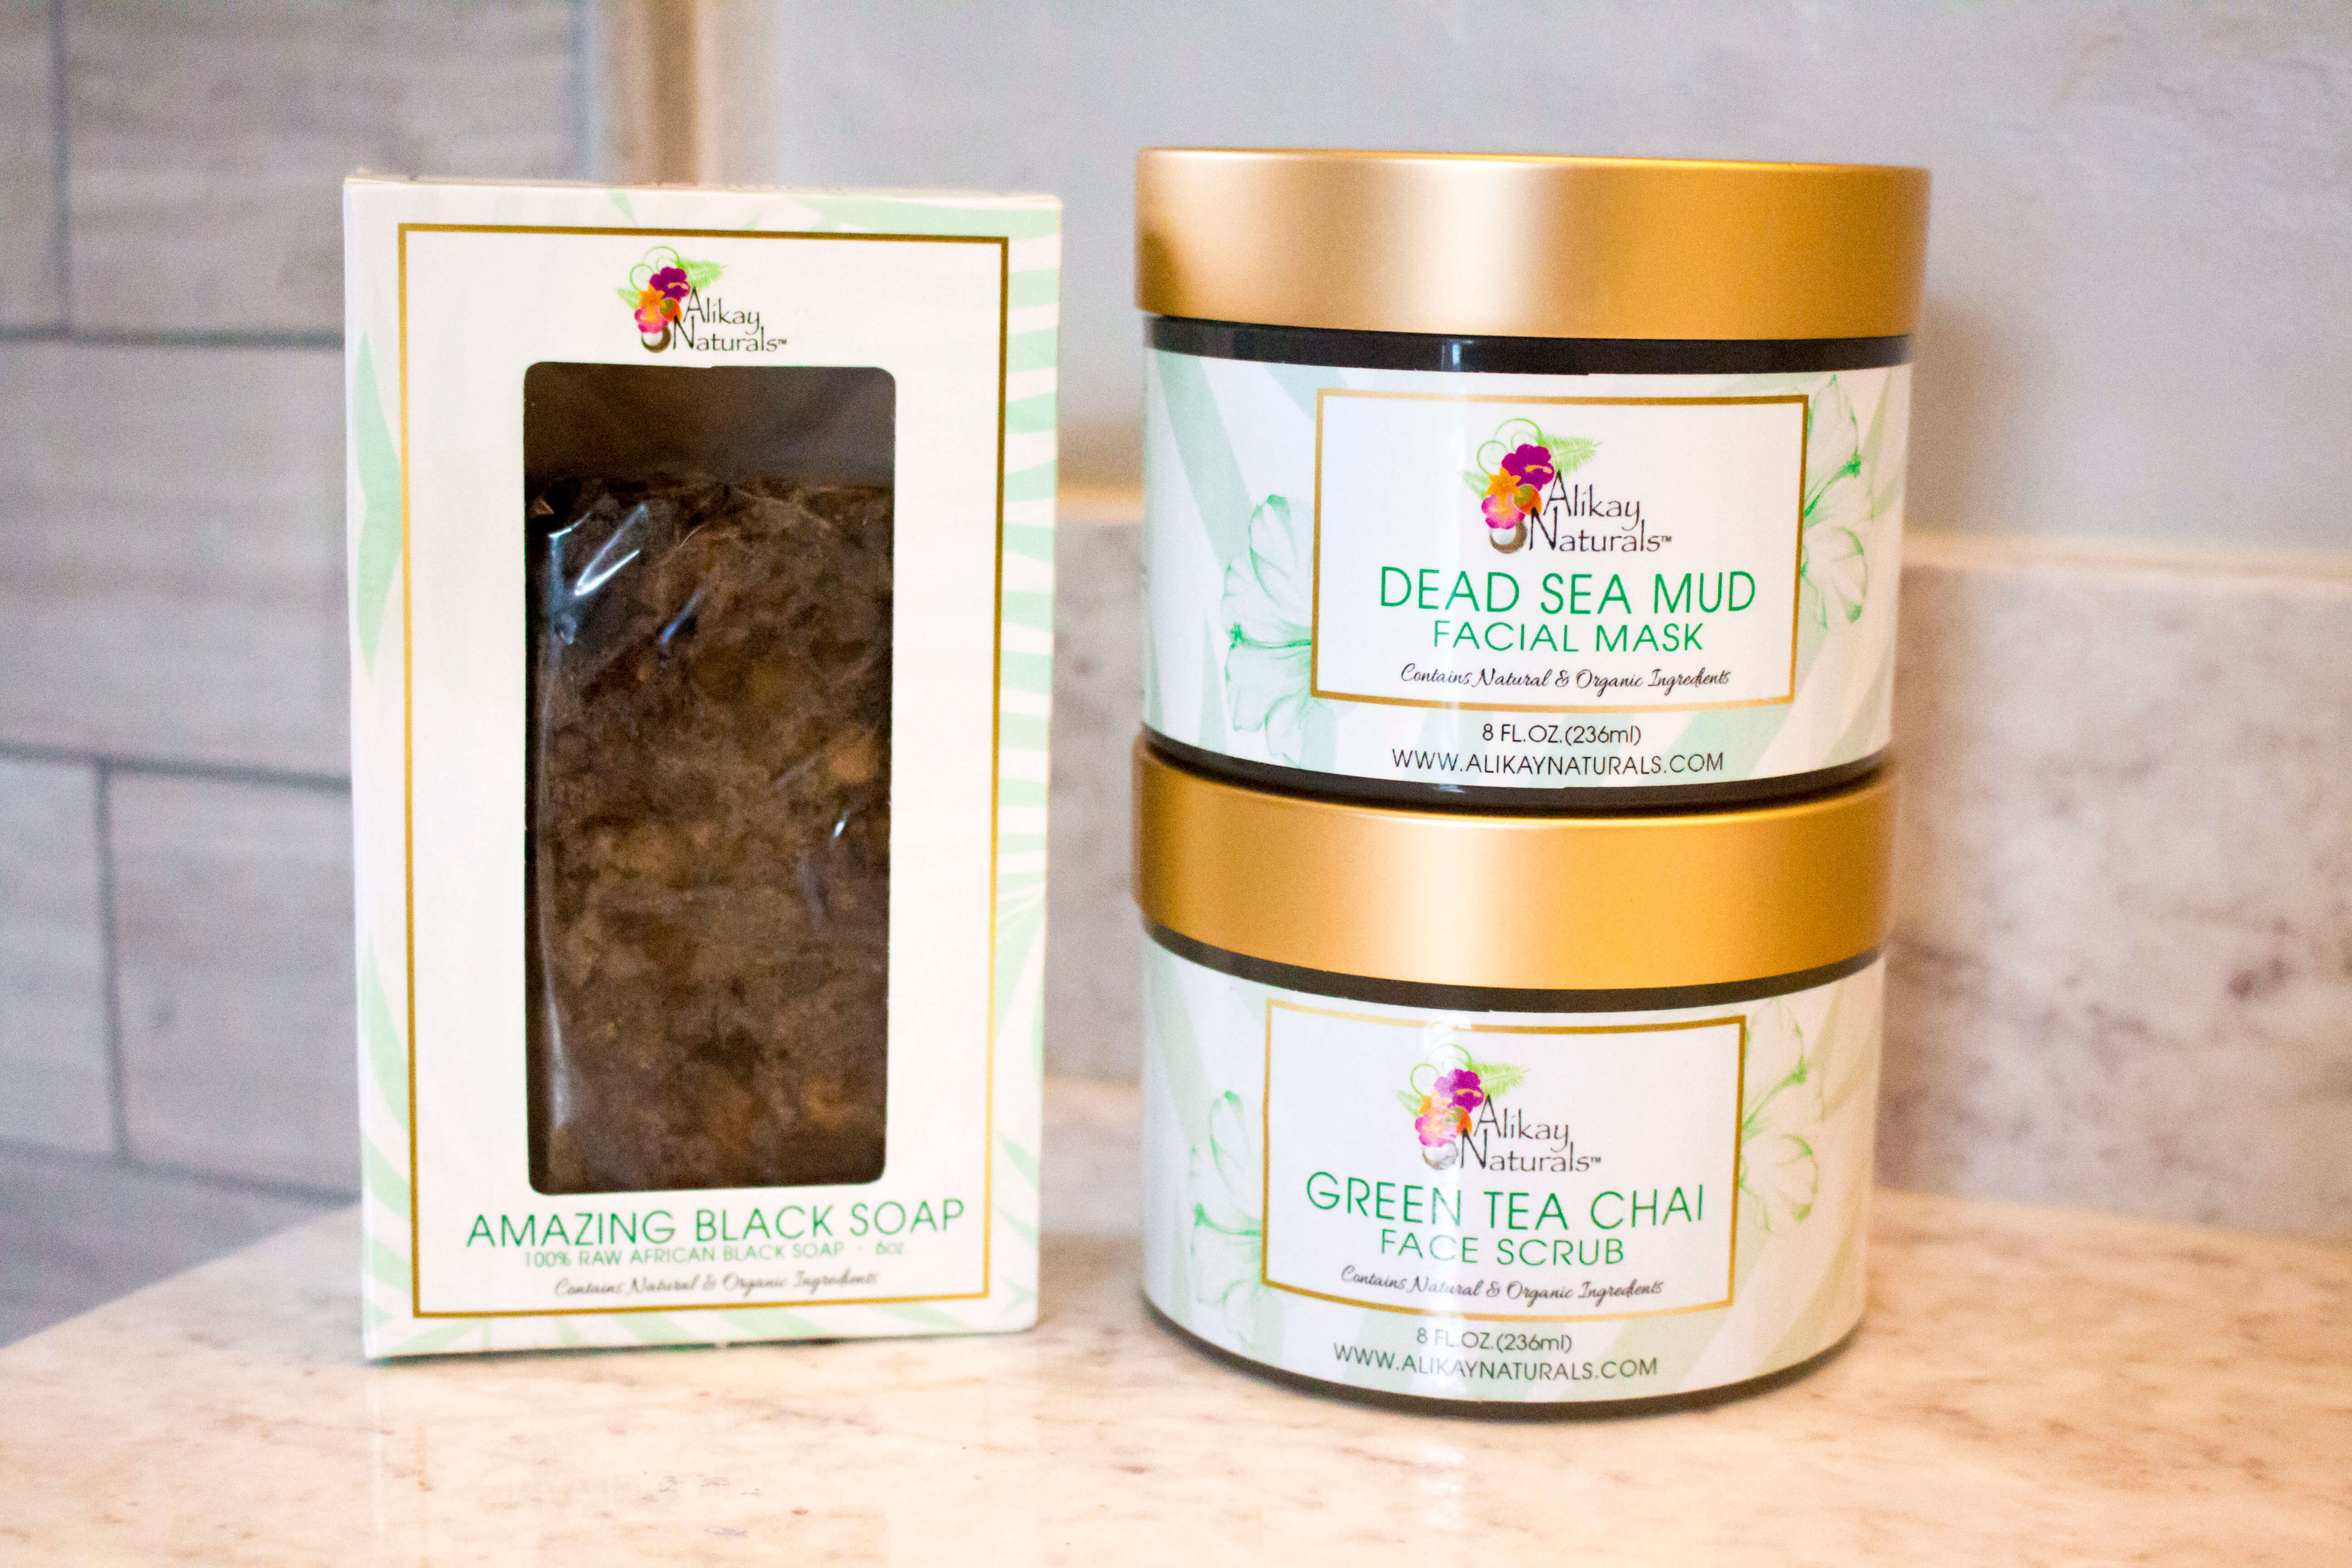 Alikay Naturals Natural and Organic Skin Care